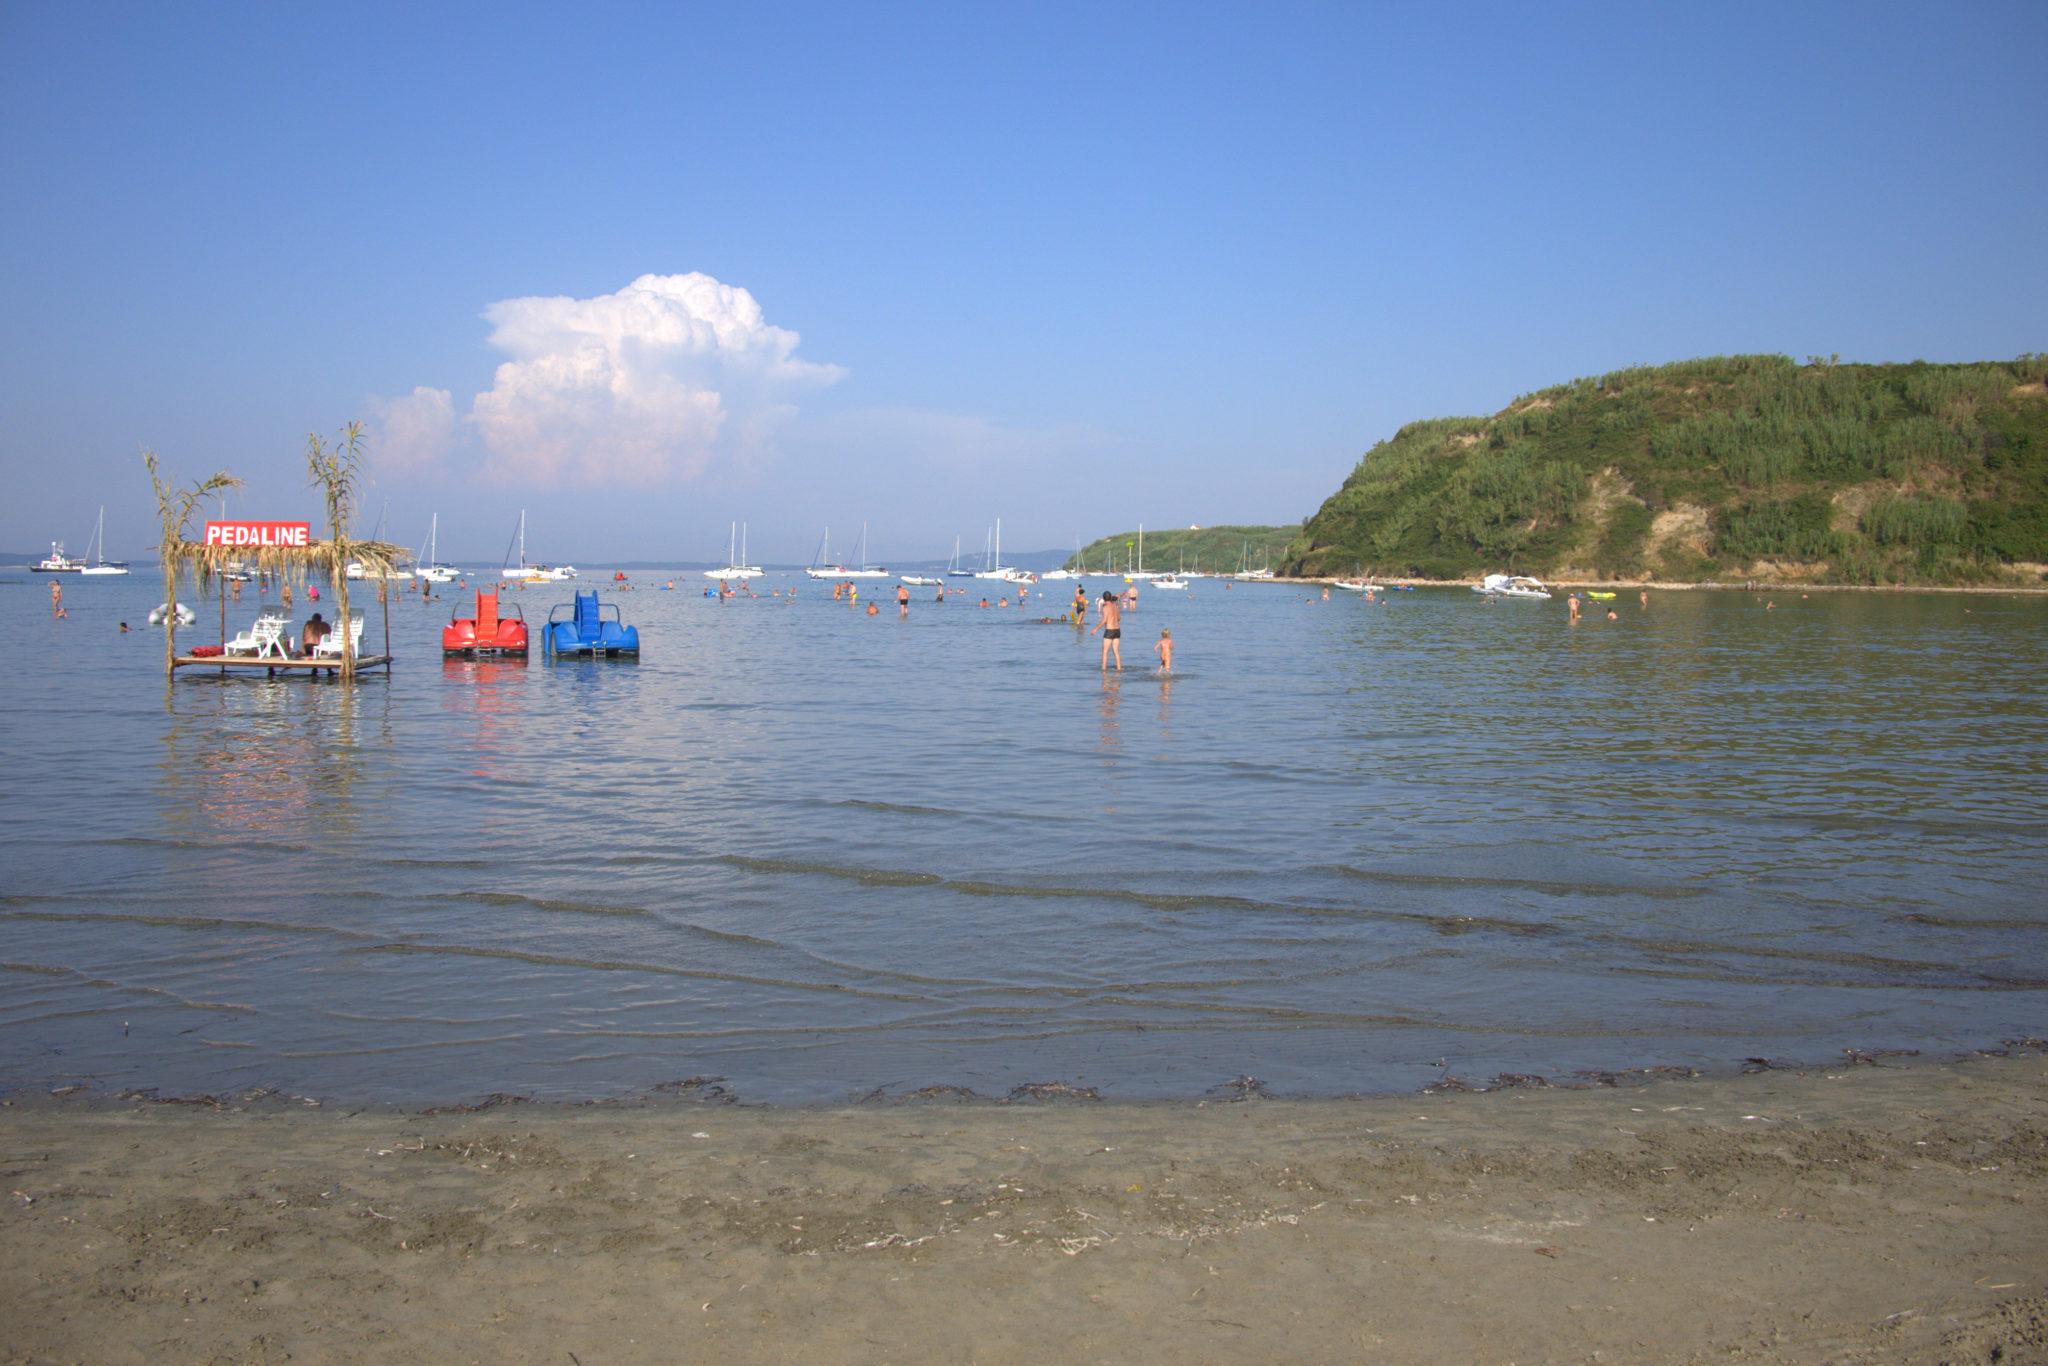 Susak, the main beach